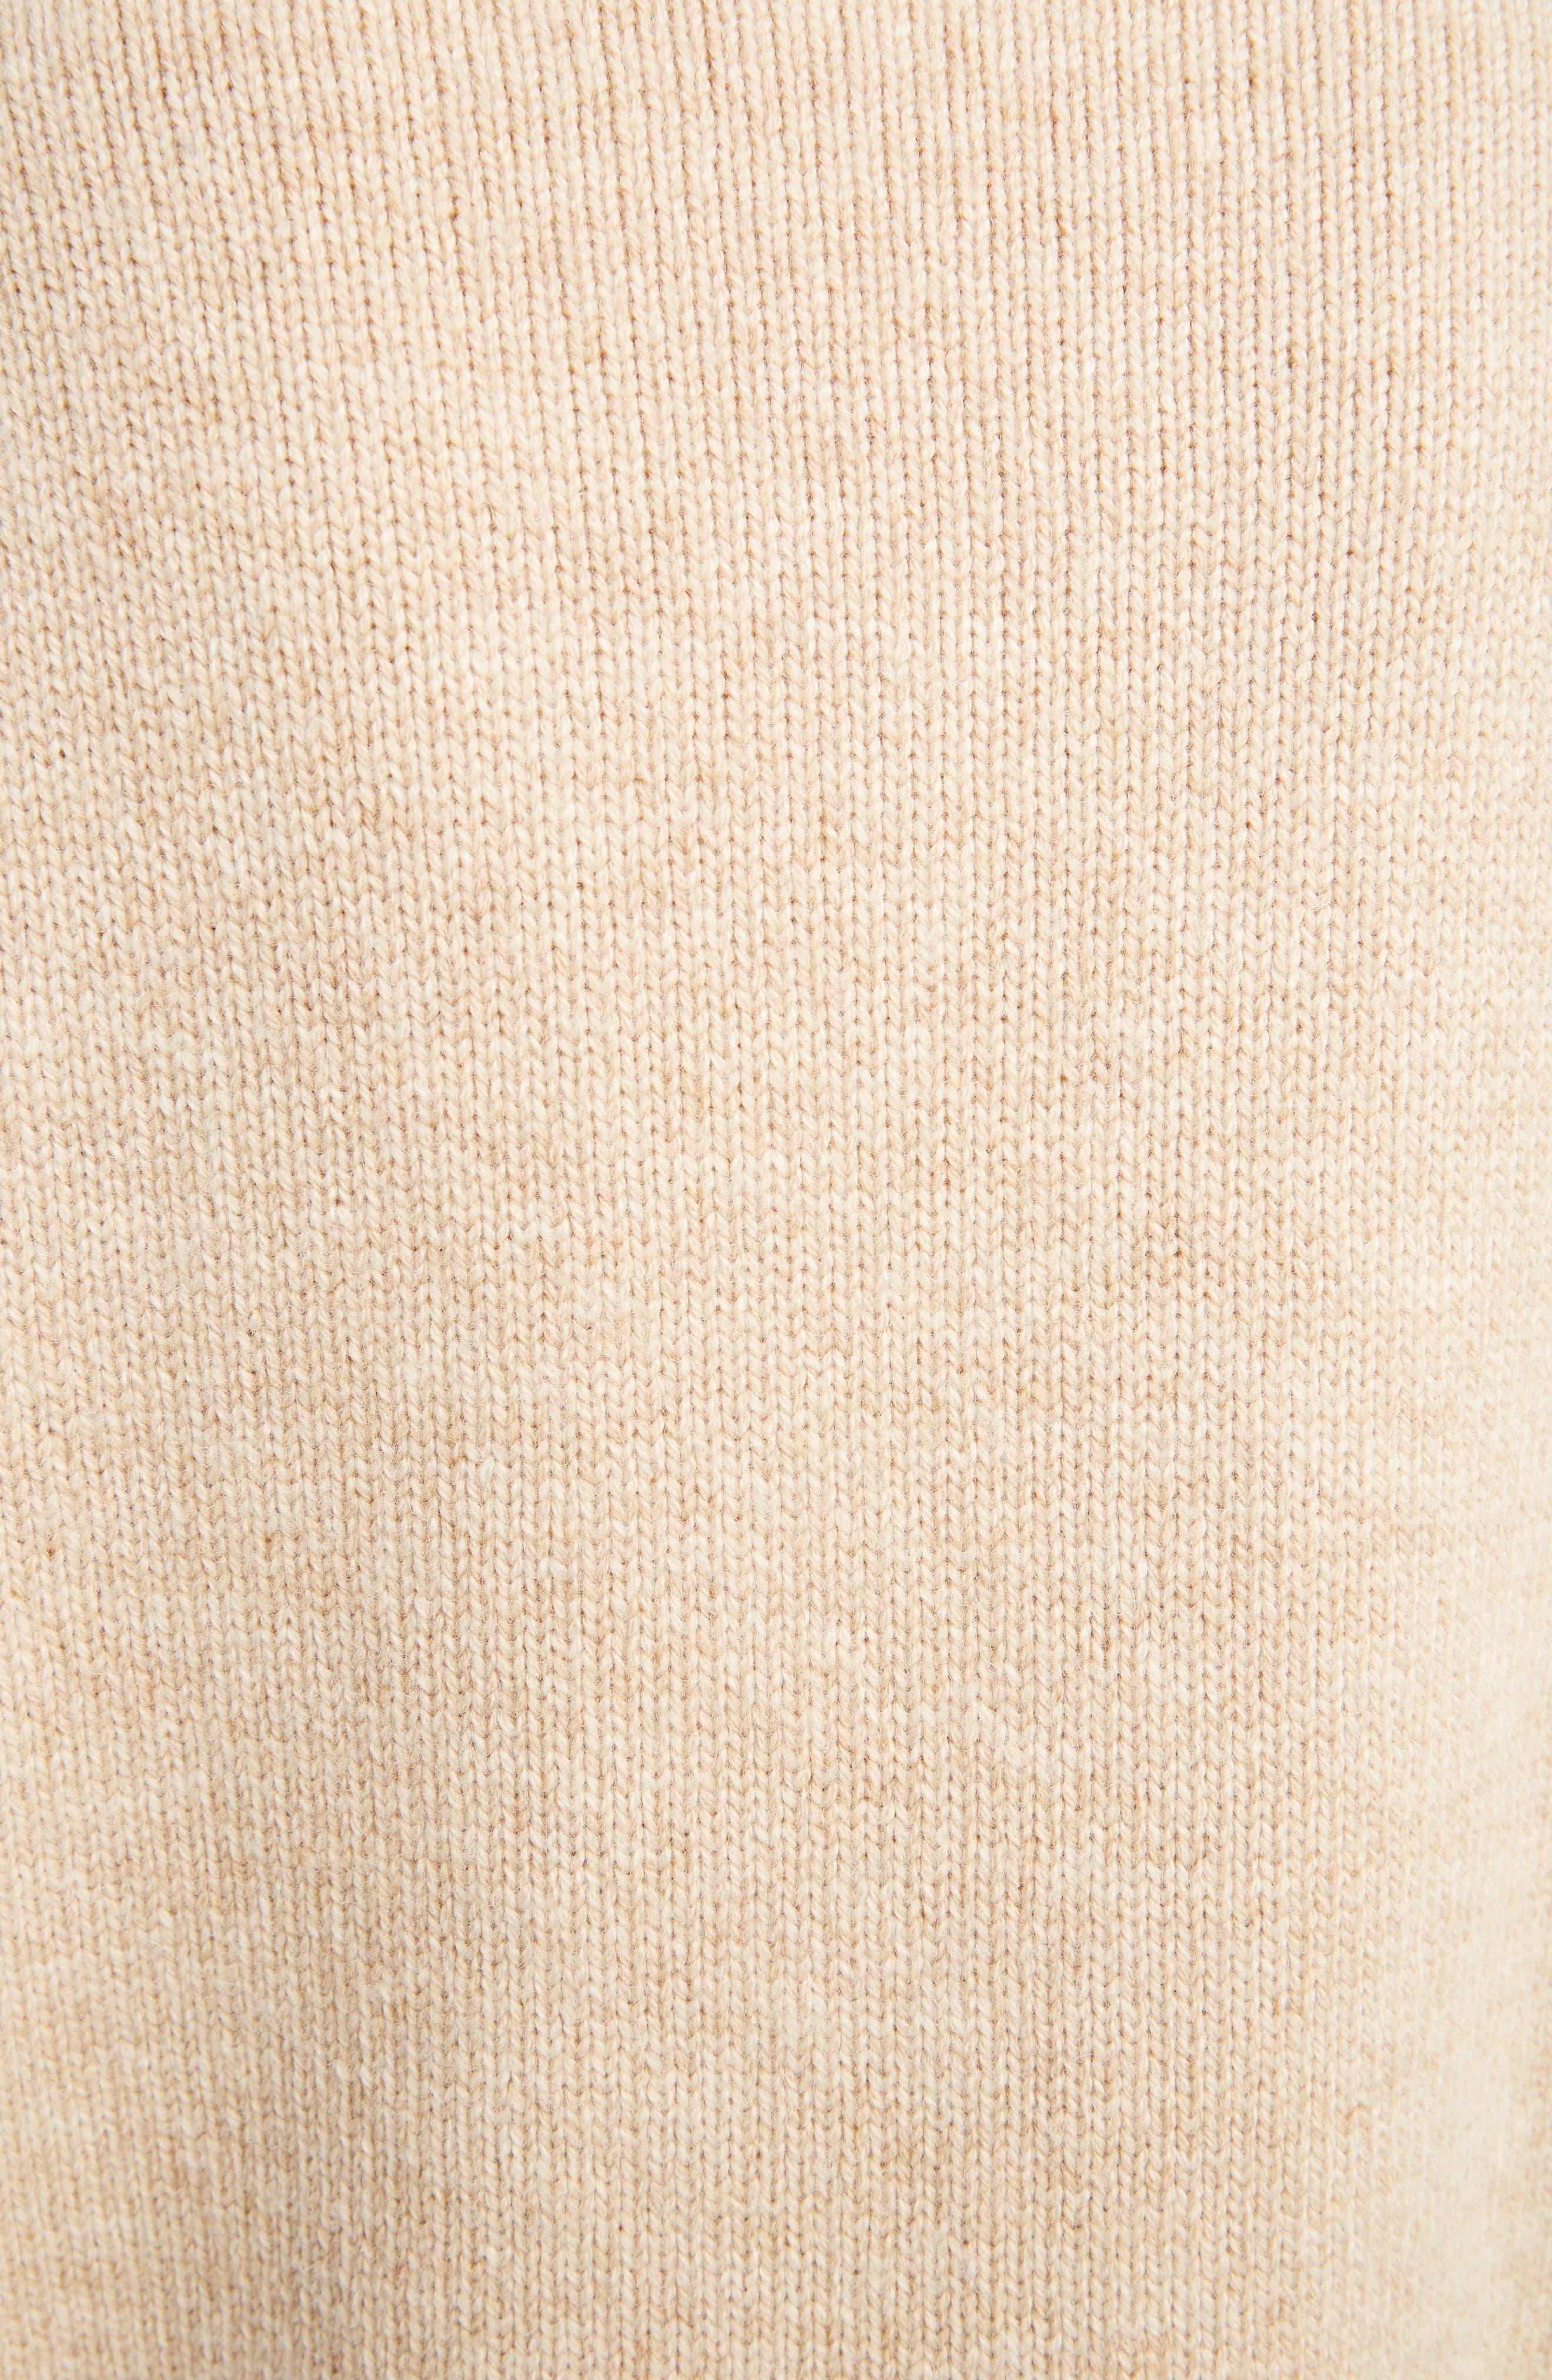 Sleeve Pocket Wool Sweater,                             Alternate thumbnail 5, color,                             Oatmeal